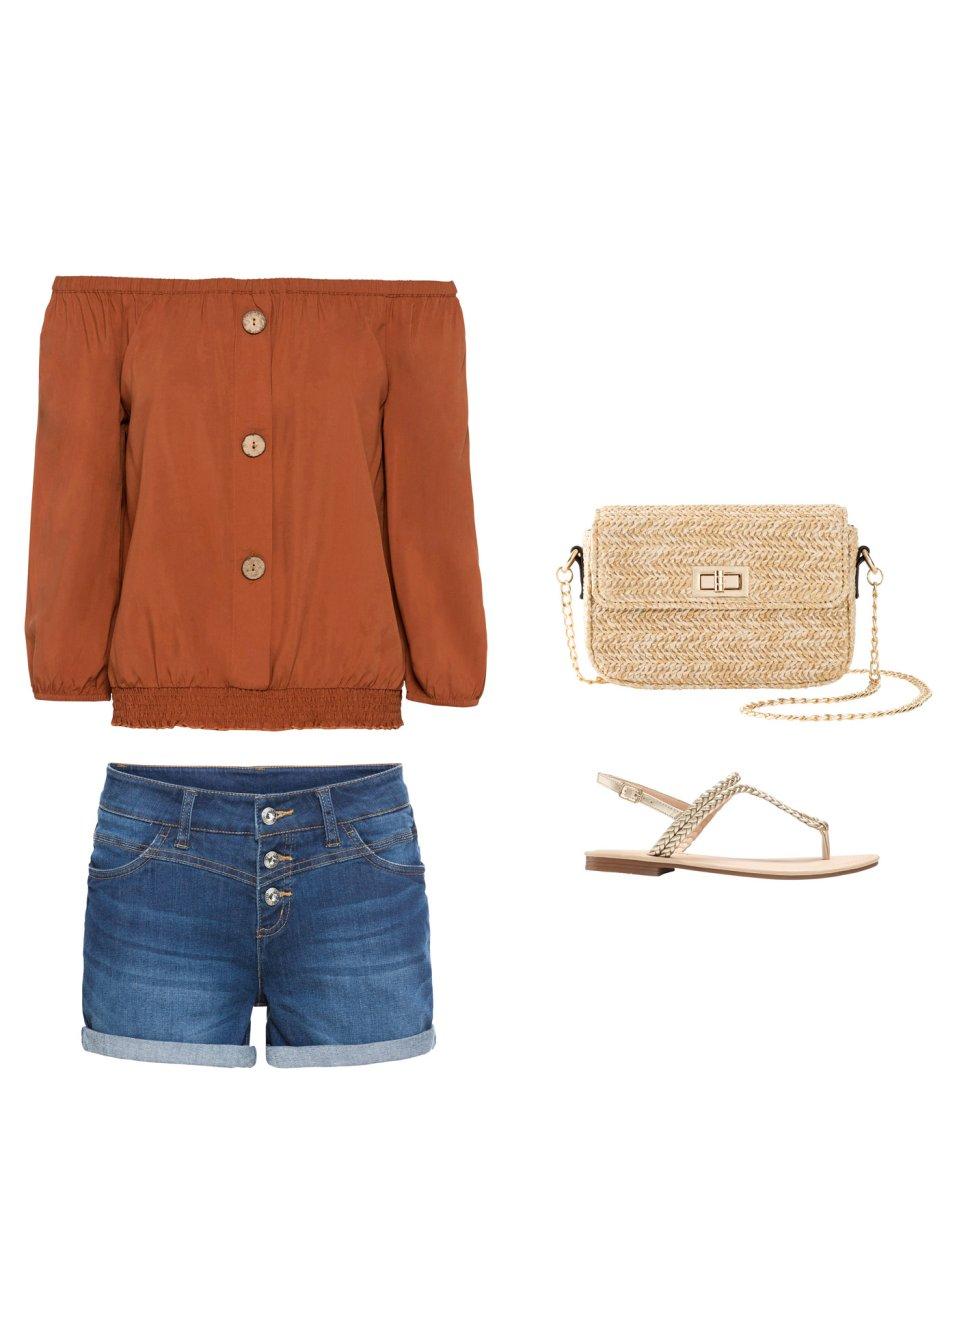 Mode Femme Vêtements DJLfdOFlkj Blouse Carmen avec base smockée, manches 3/4 et faux boutons brun orange